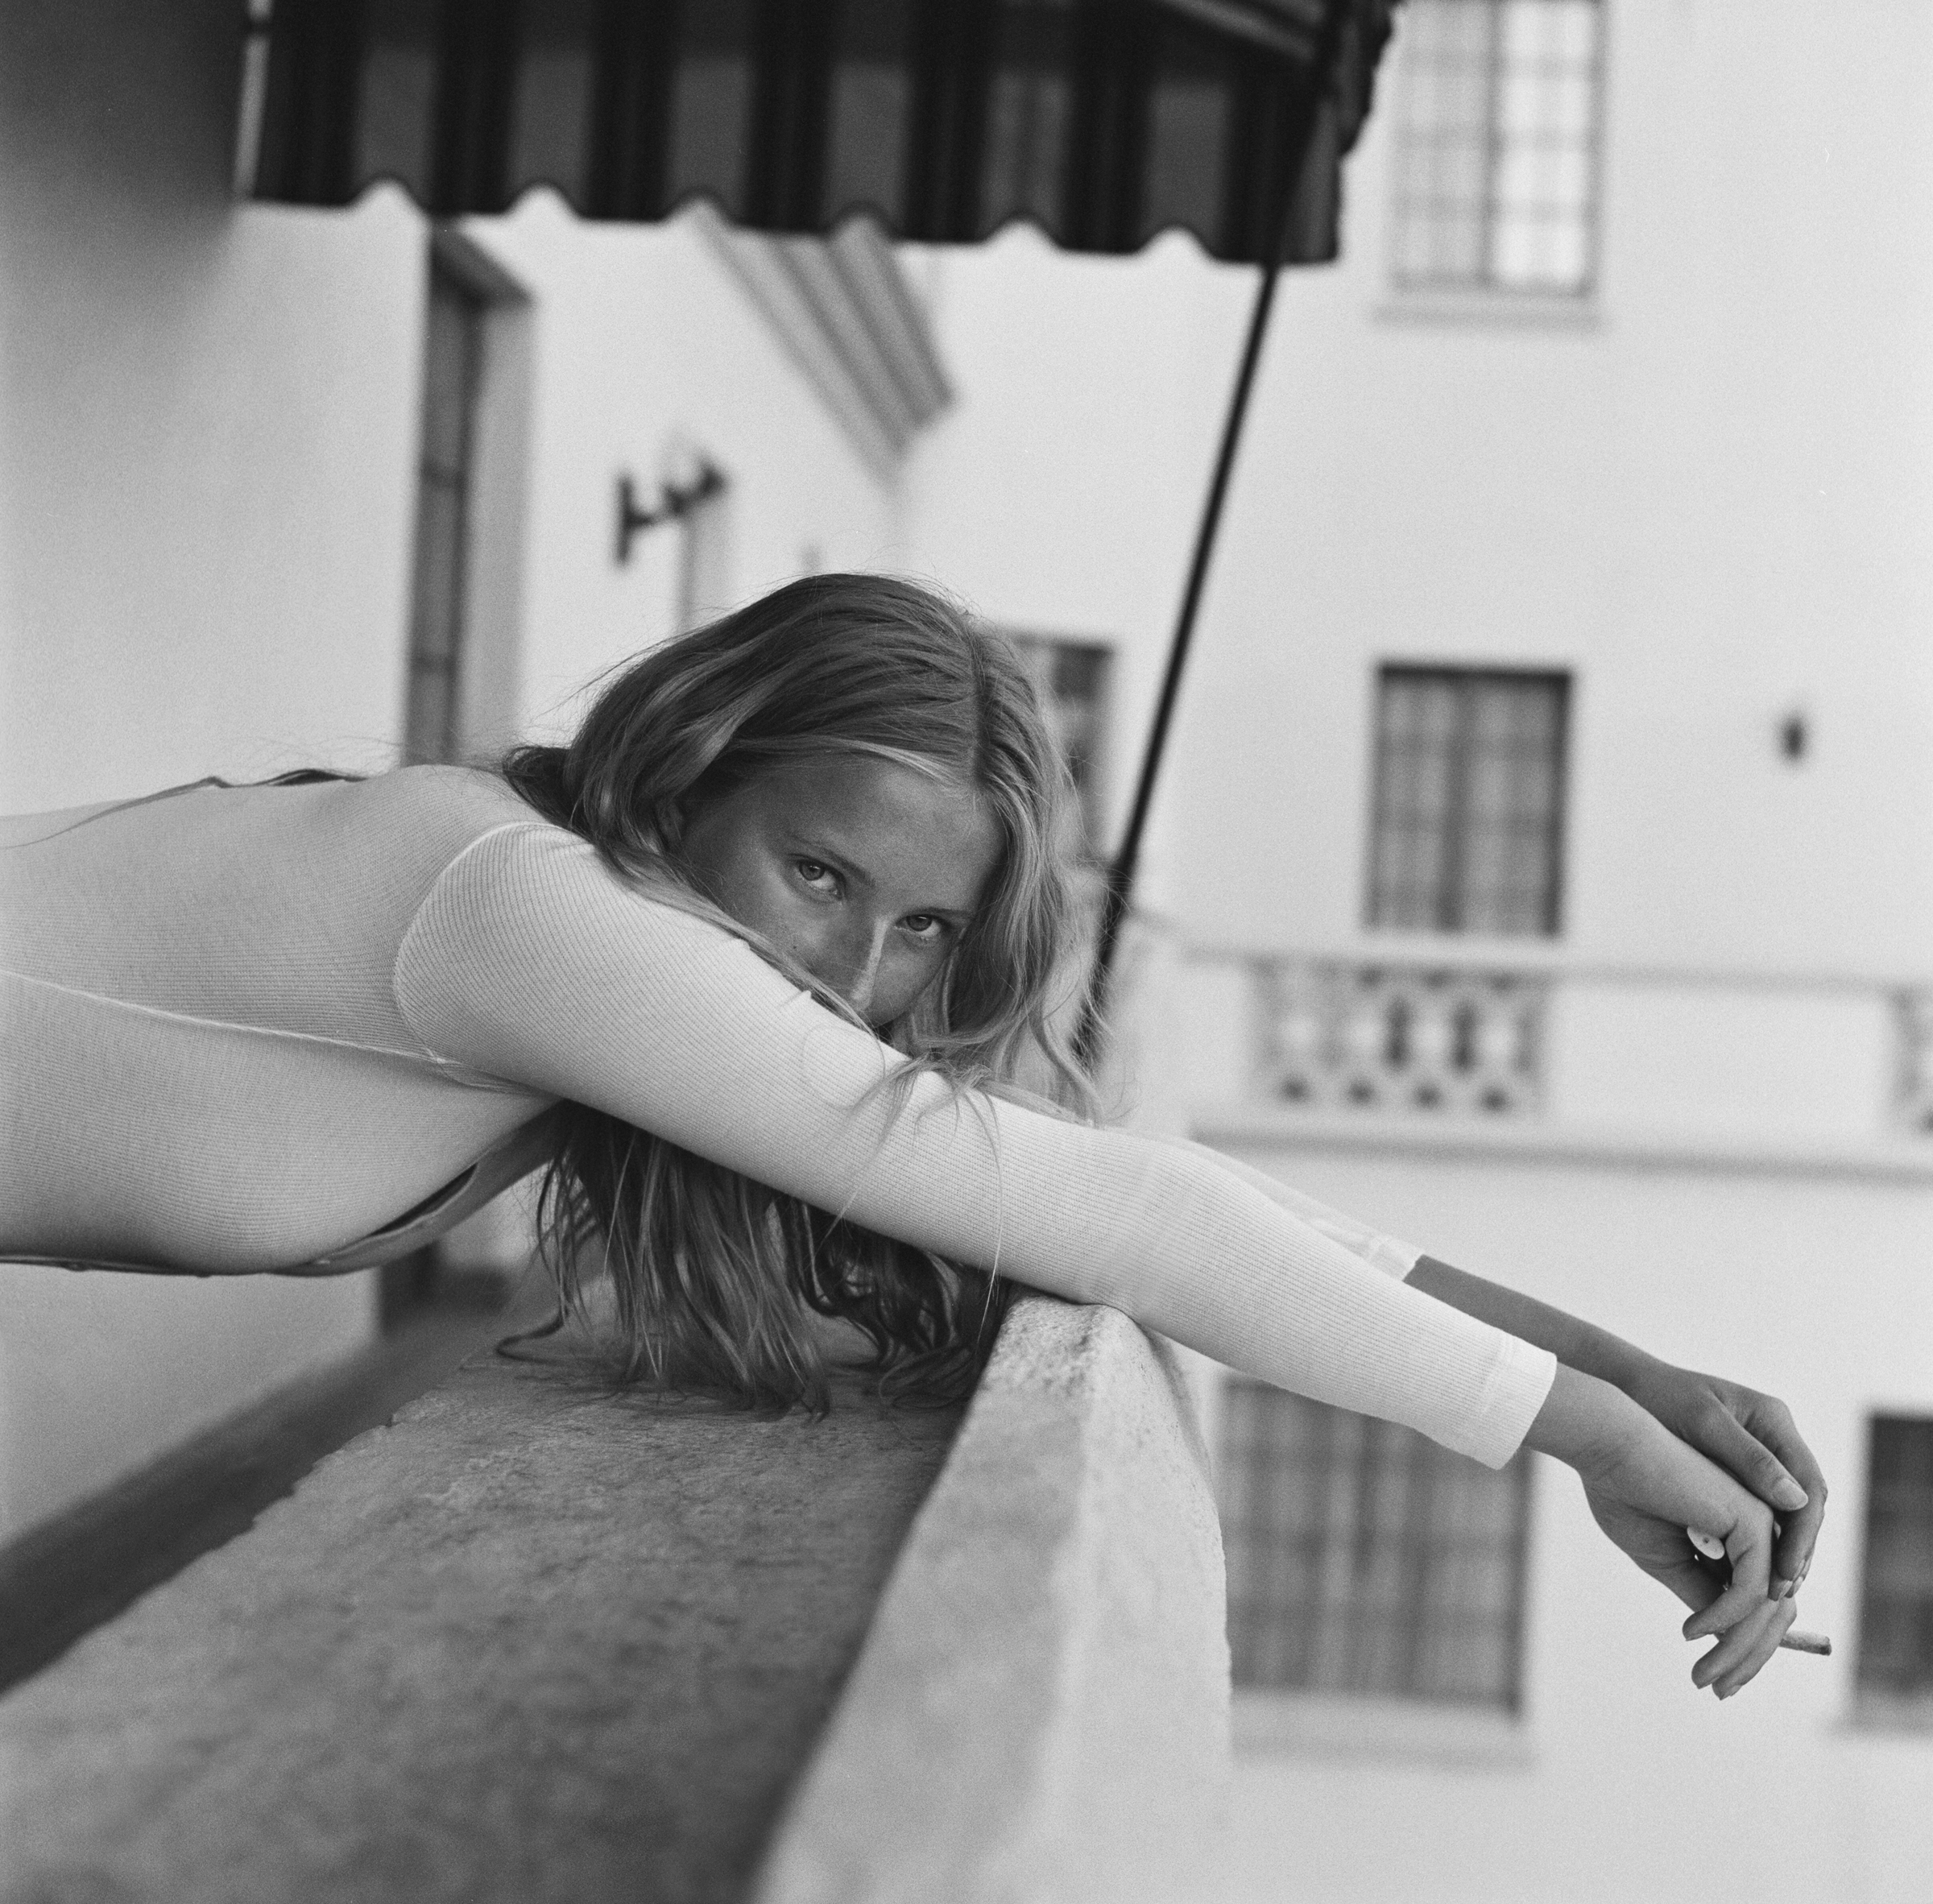 Natalie_BalconyFILM_FINAL.jpg